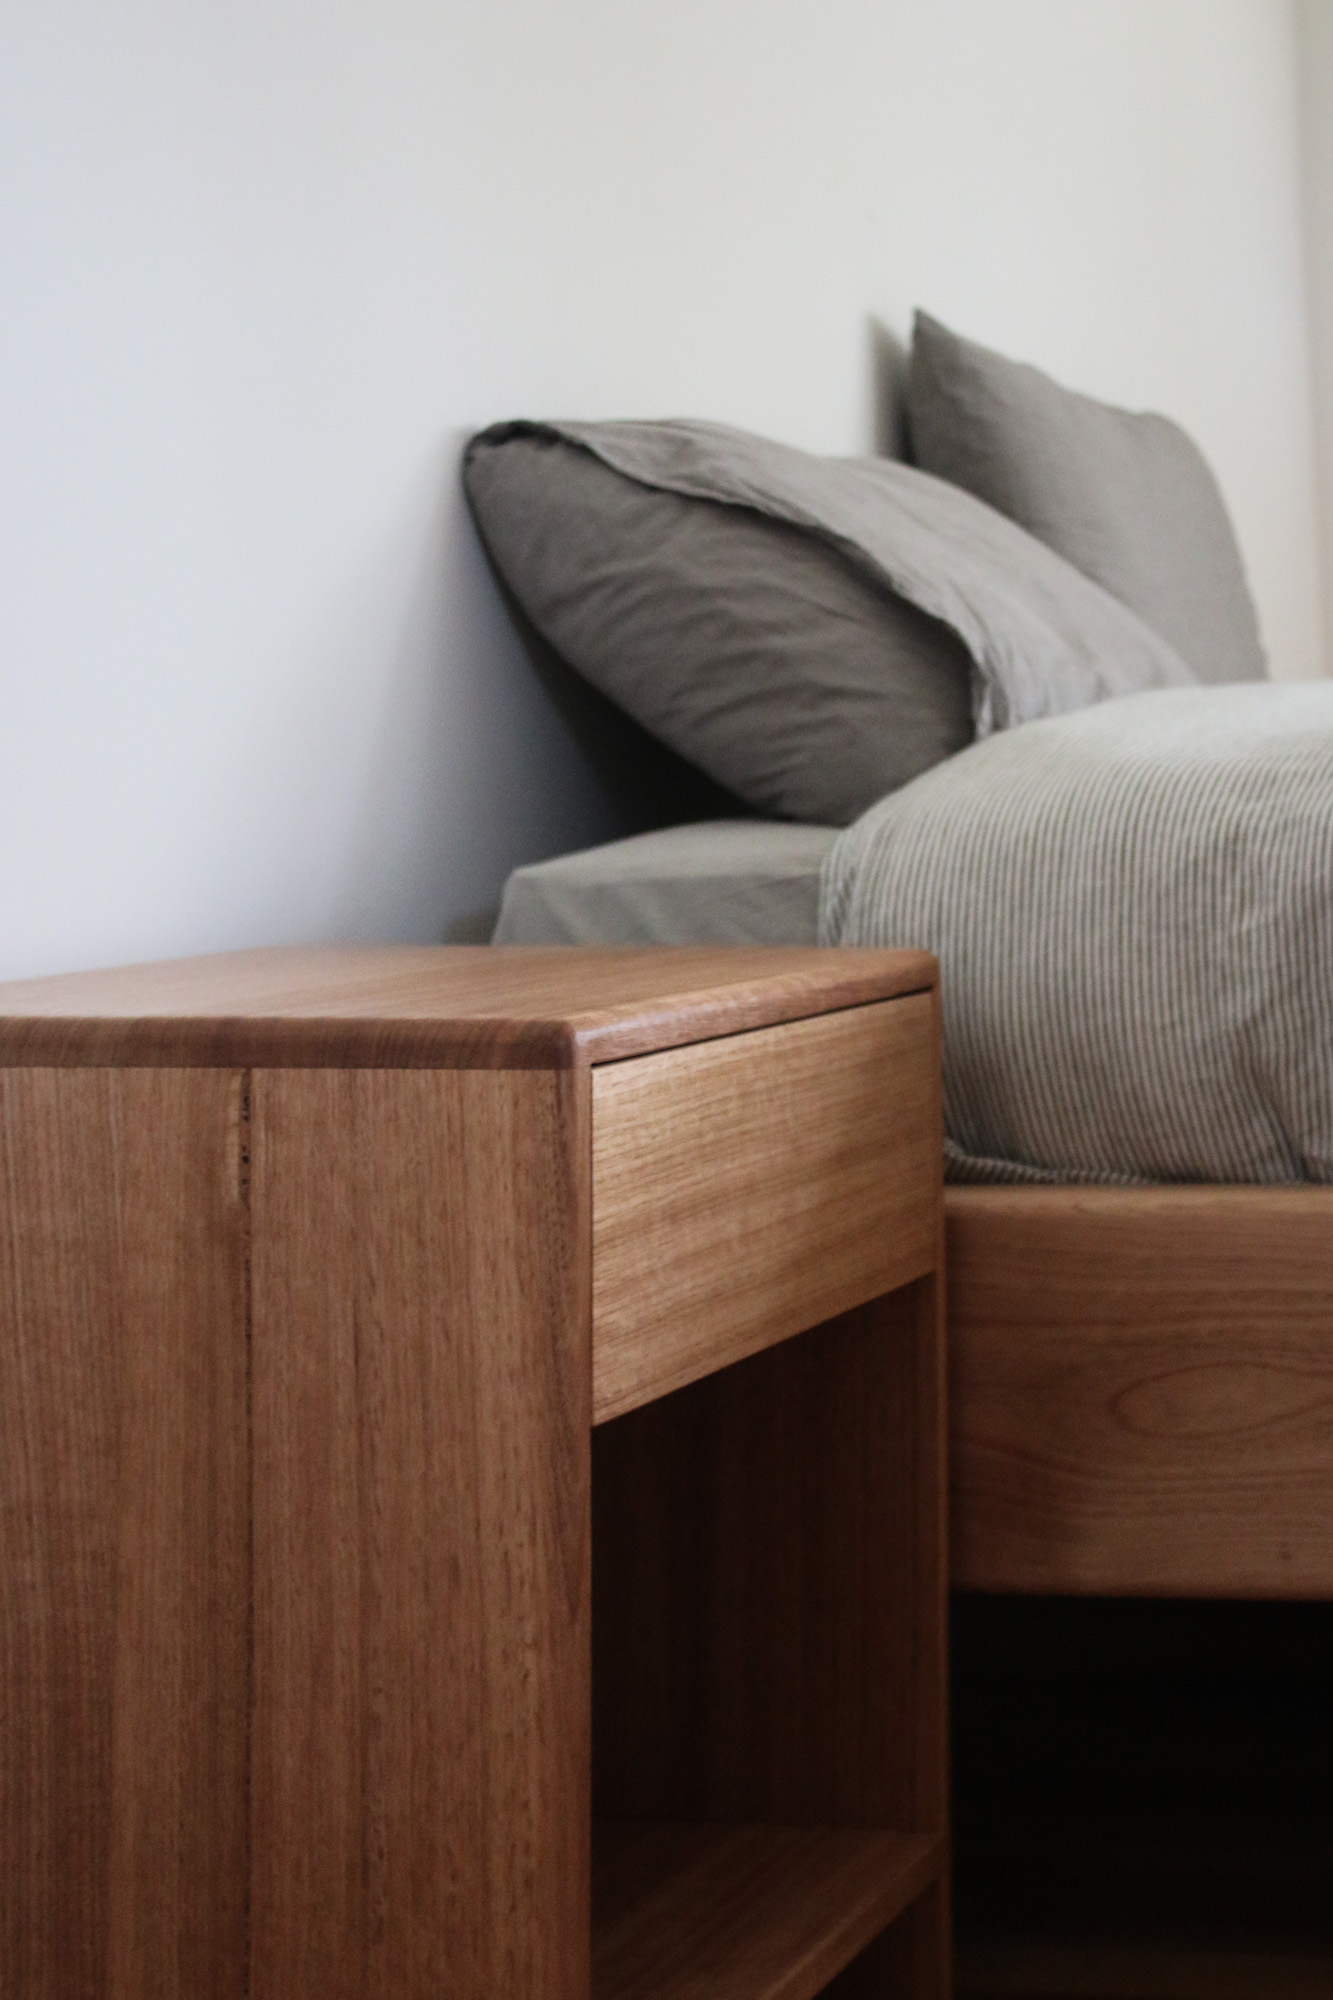 al-and-imo-handmade-simple-minimalist-low-timber-bed-frame-custom-australia-melbourne.jpg